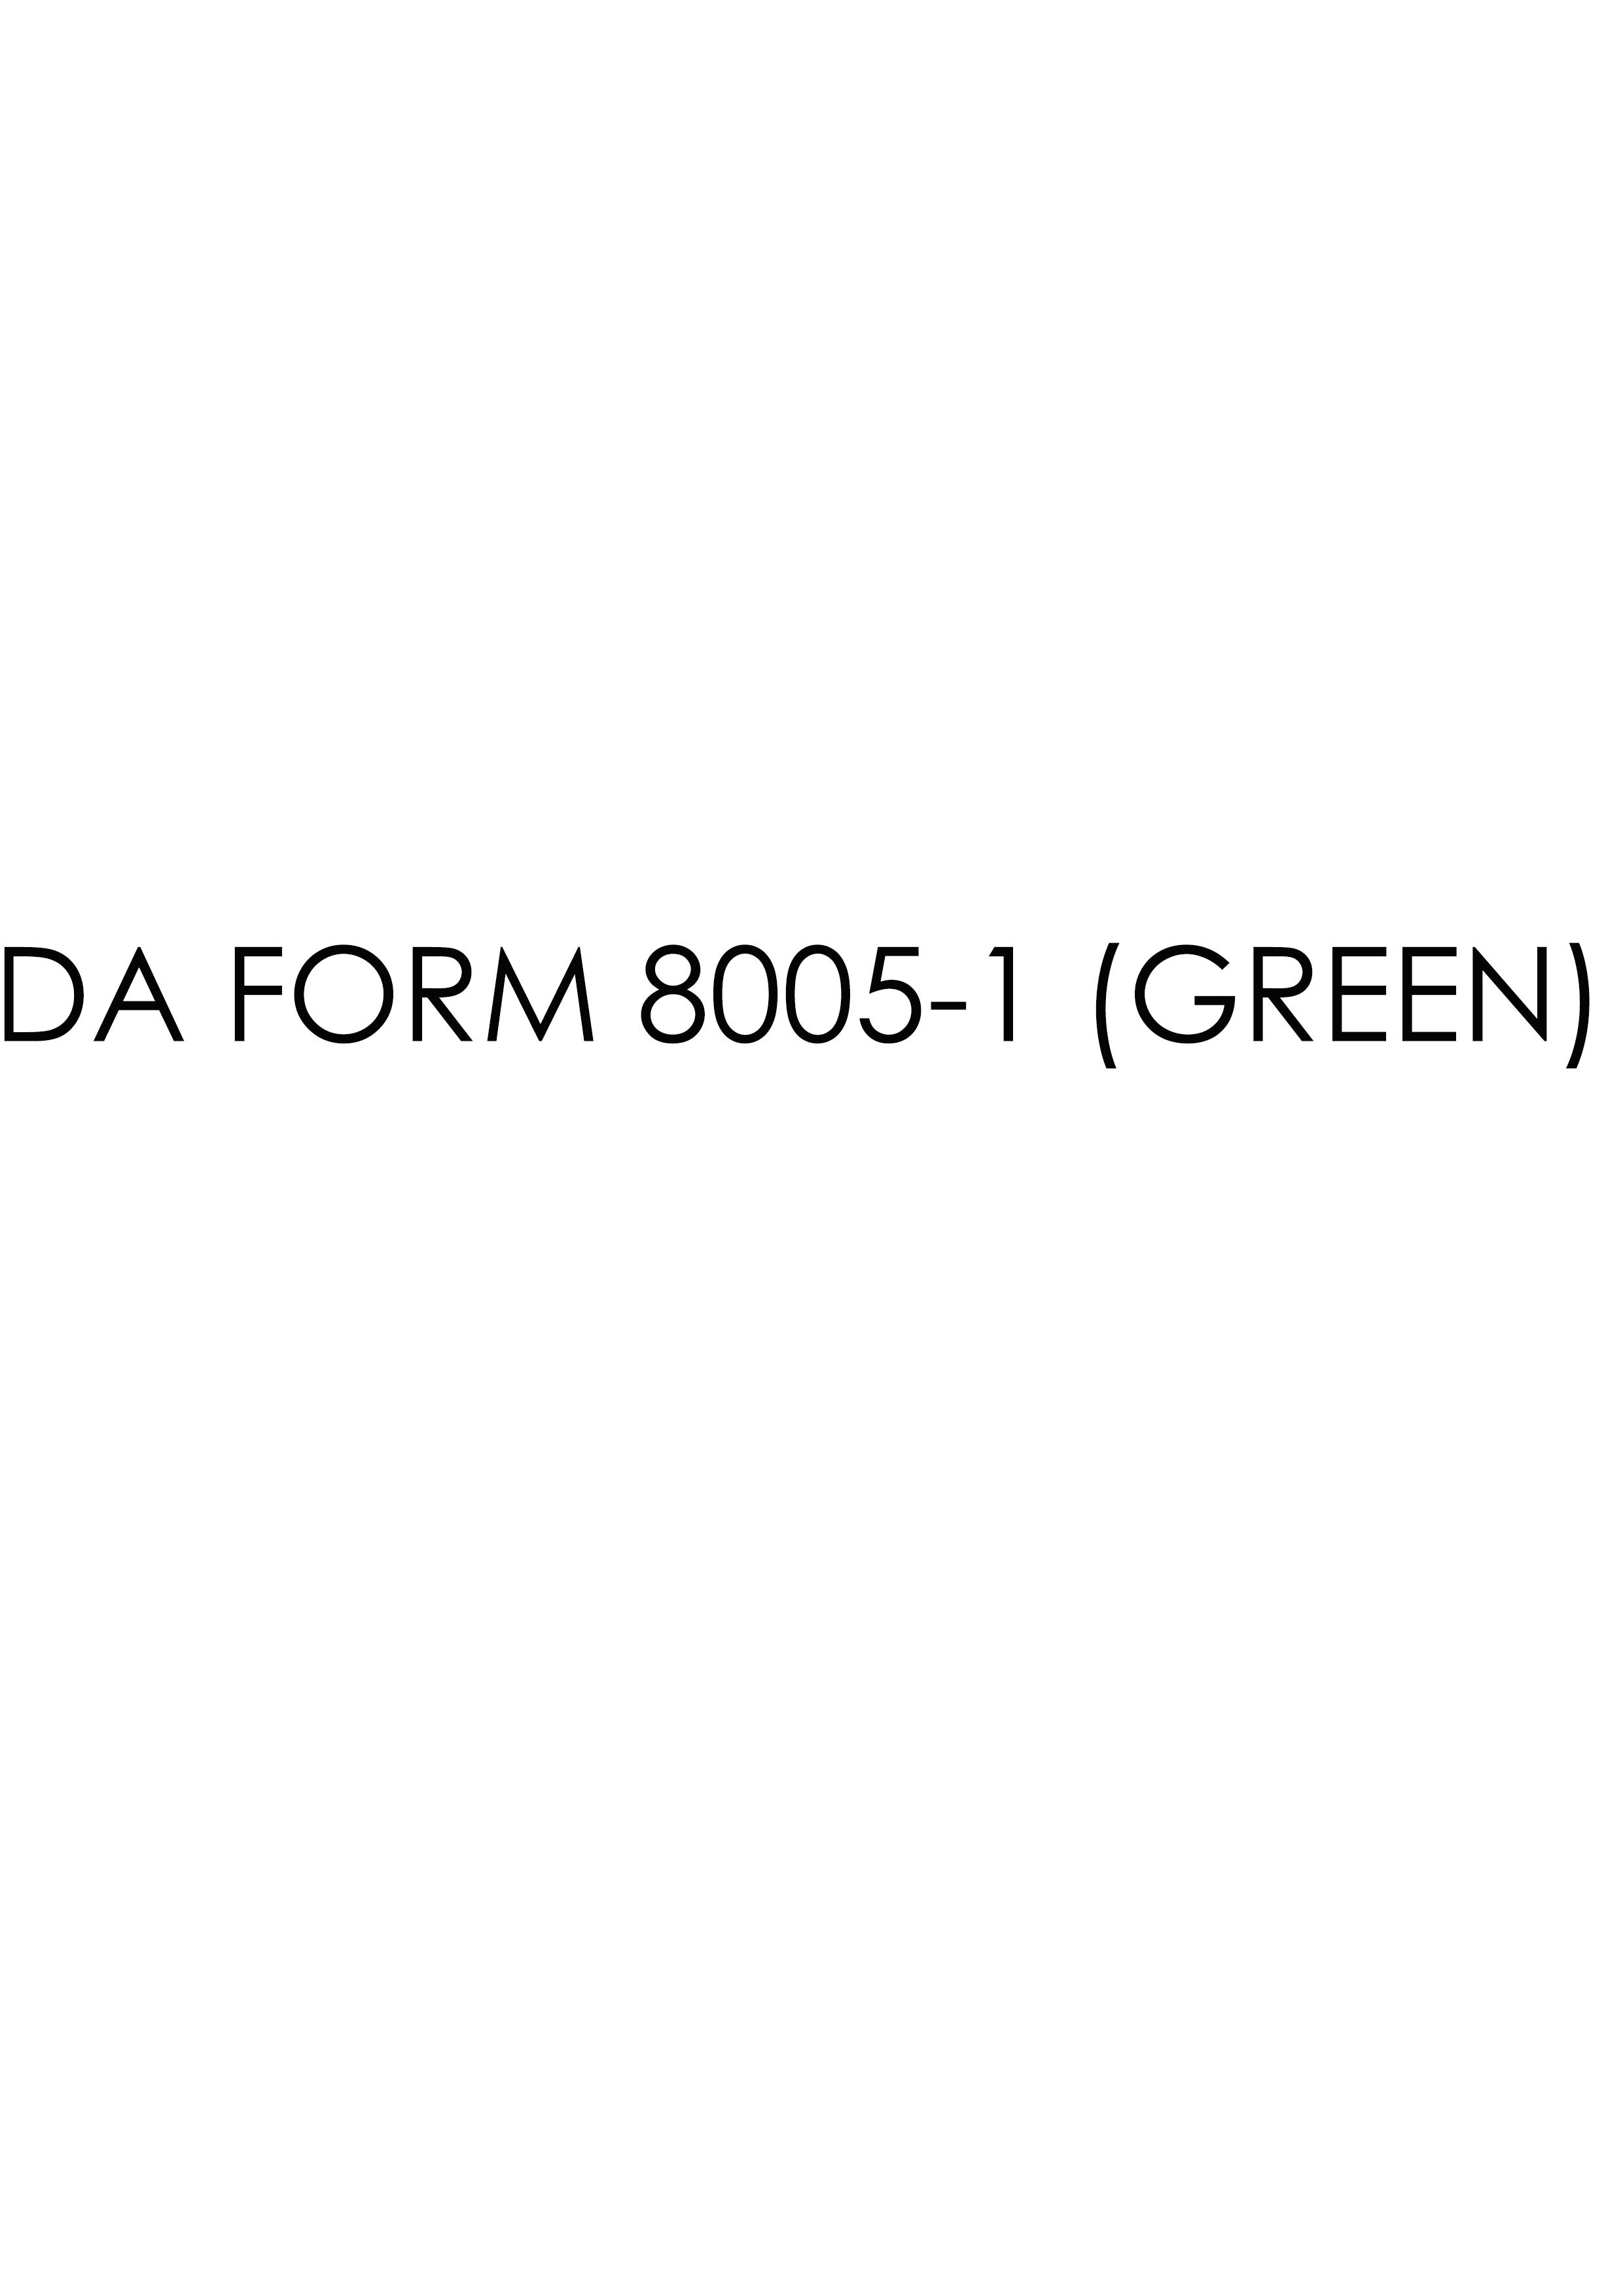 Download da Form 8005-1 (GREEN) Free